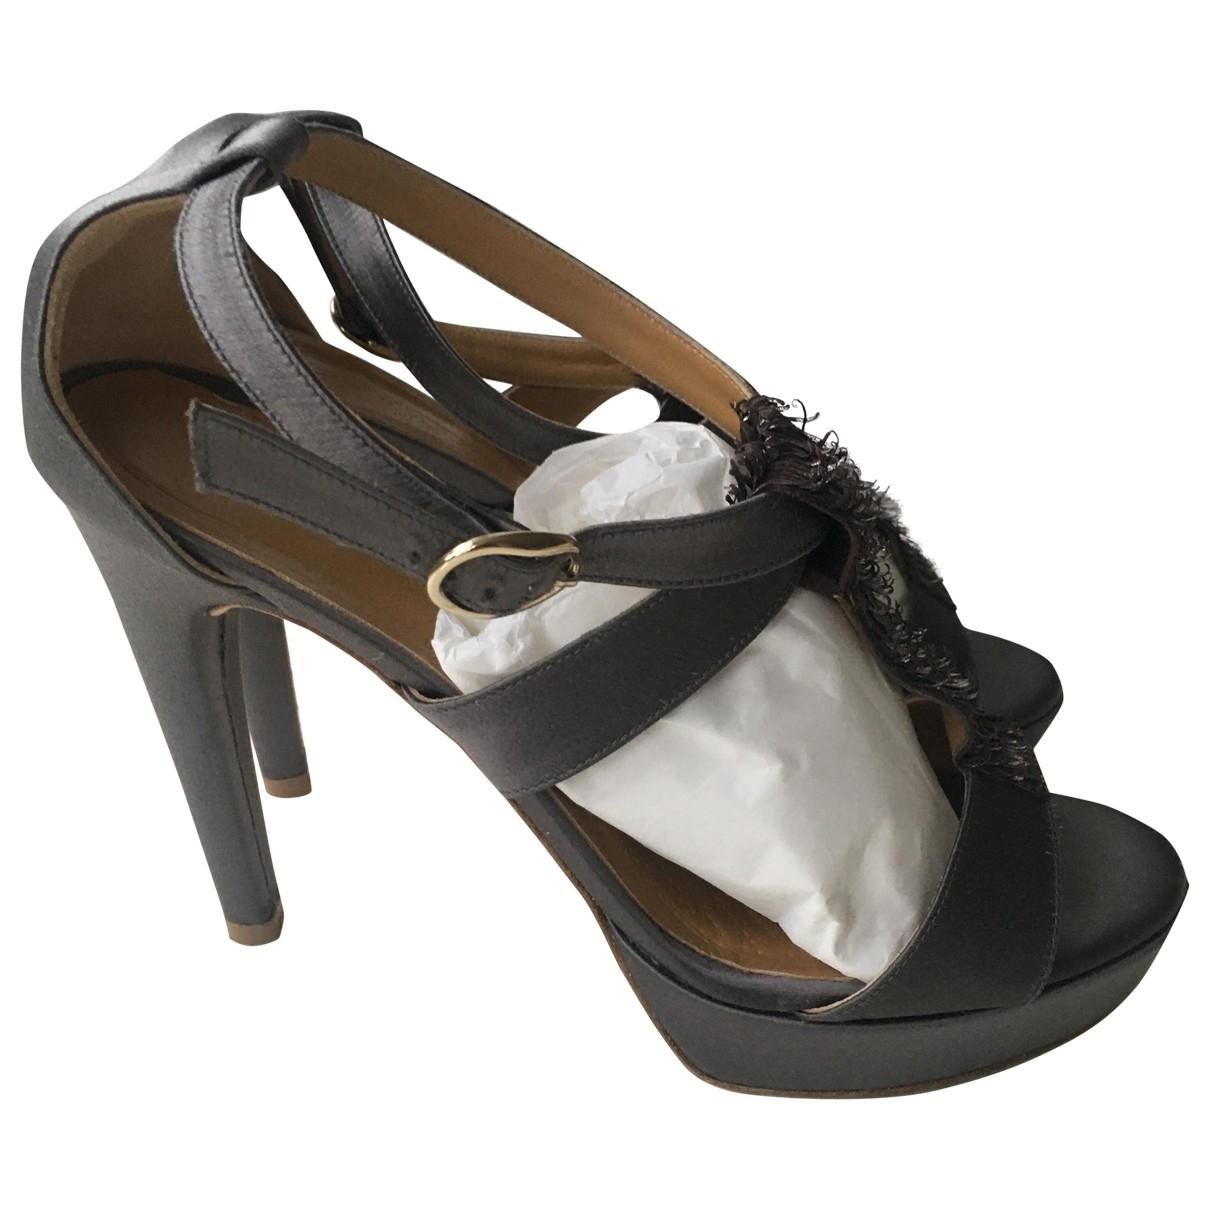 Sandalias de Lona Anya Hindmarch